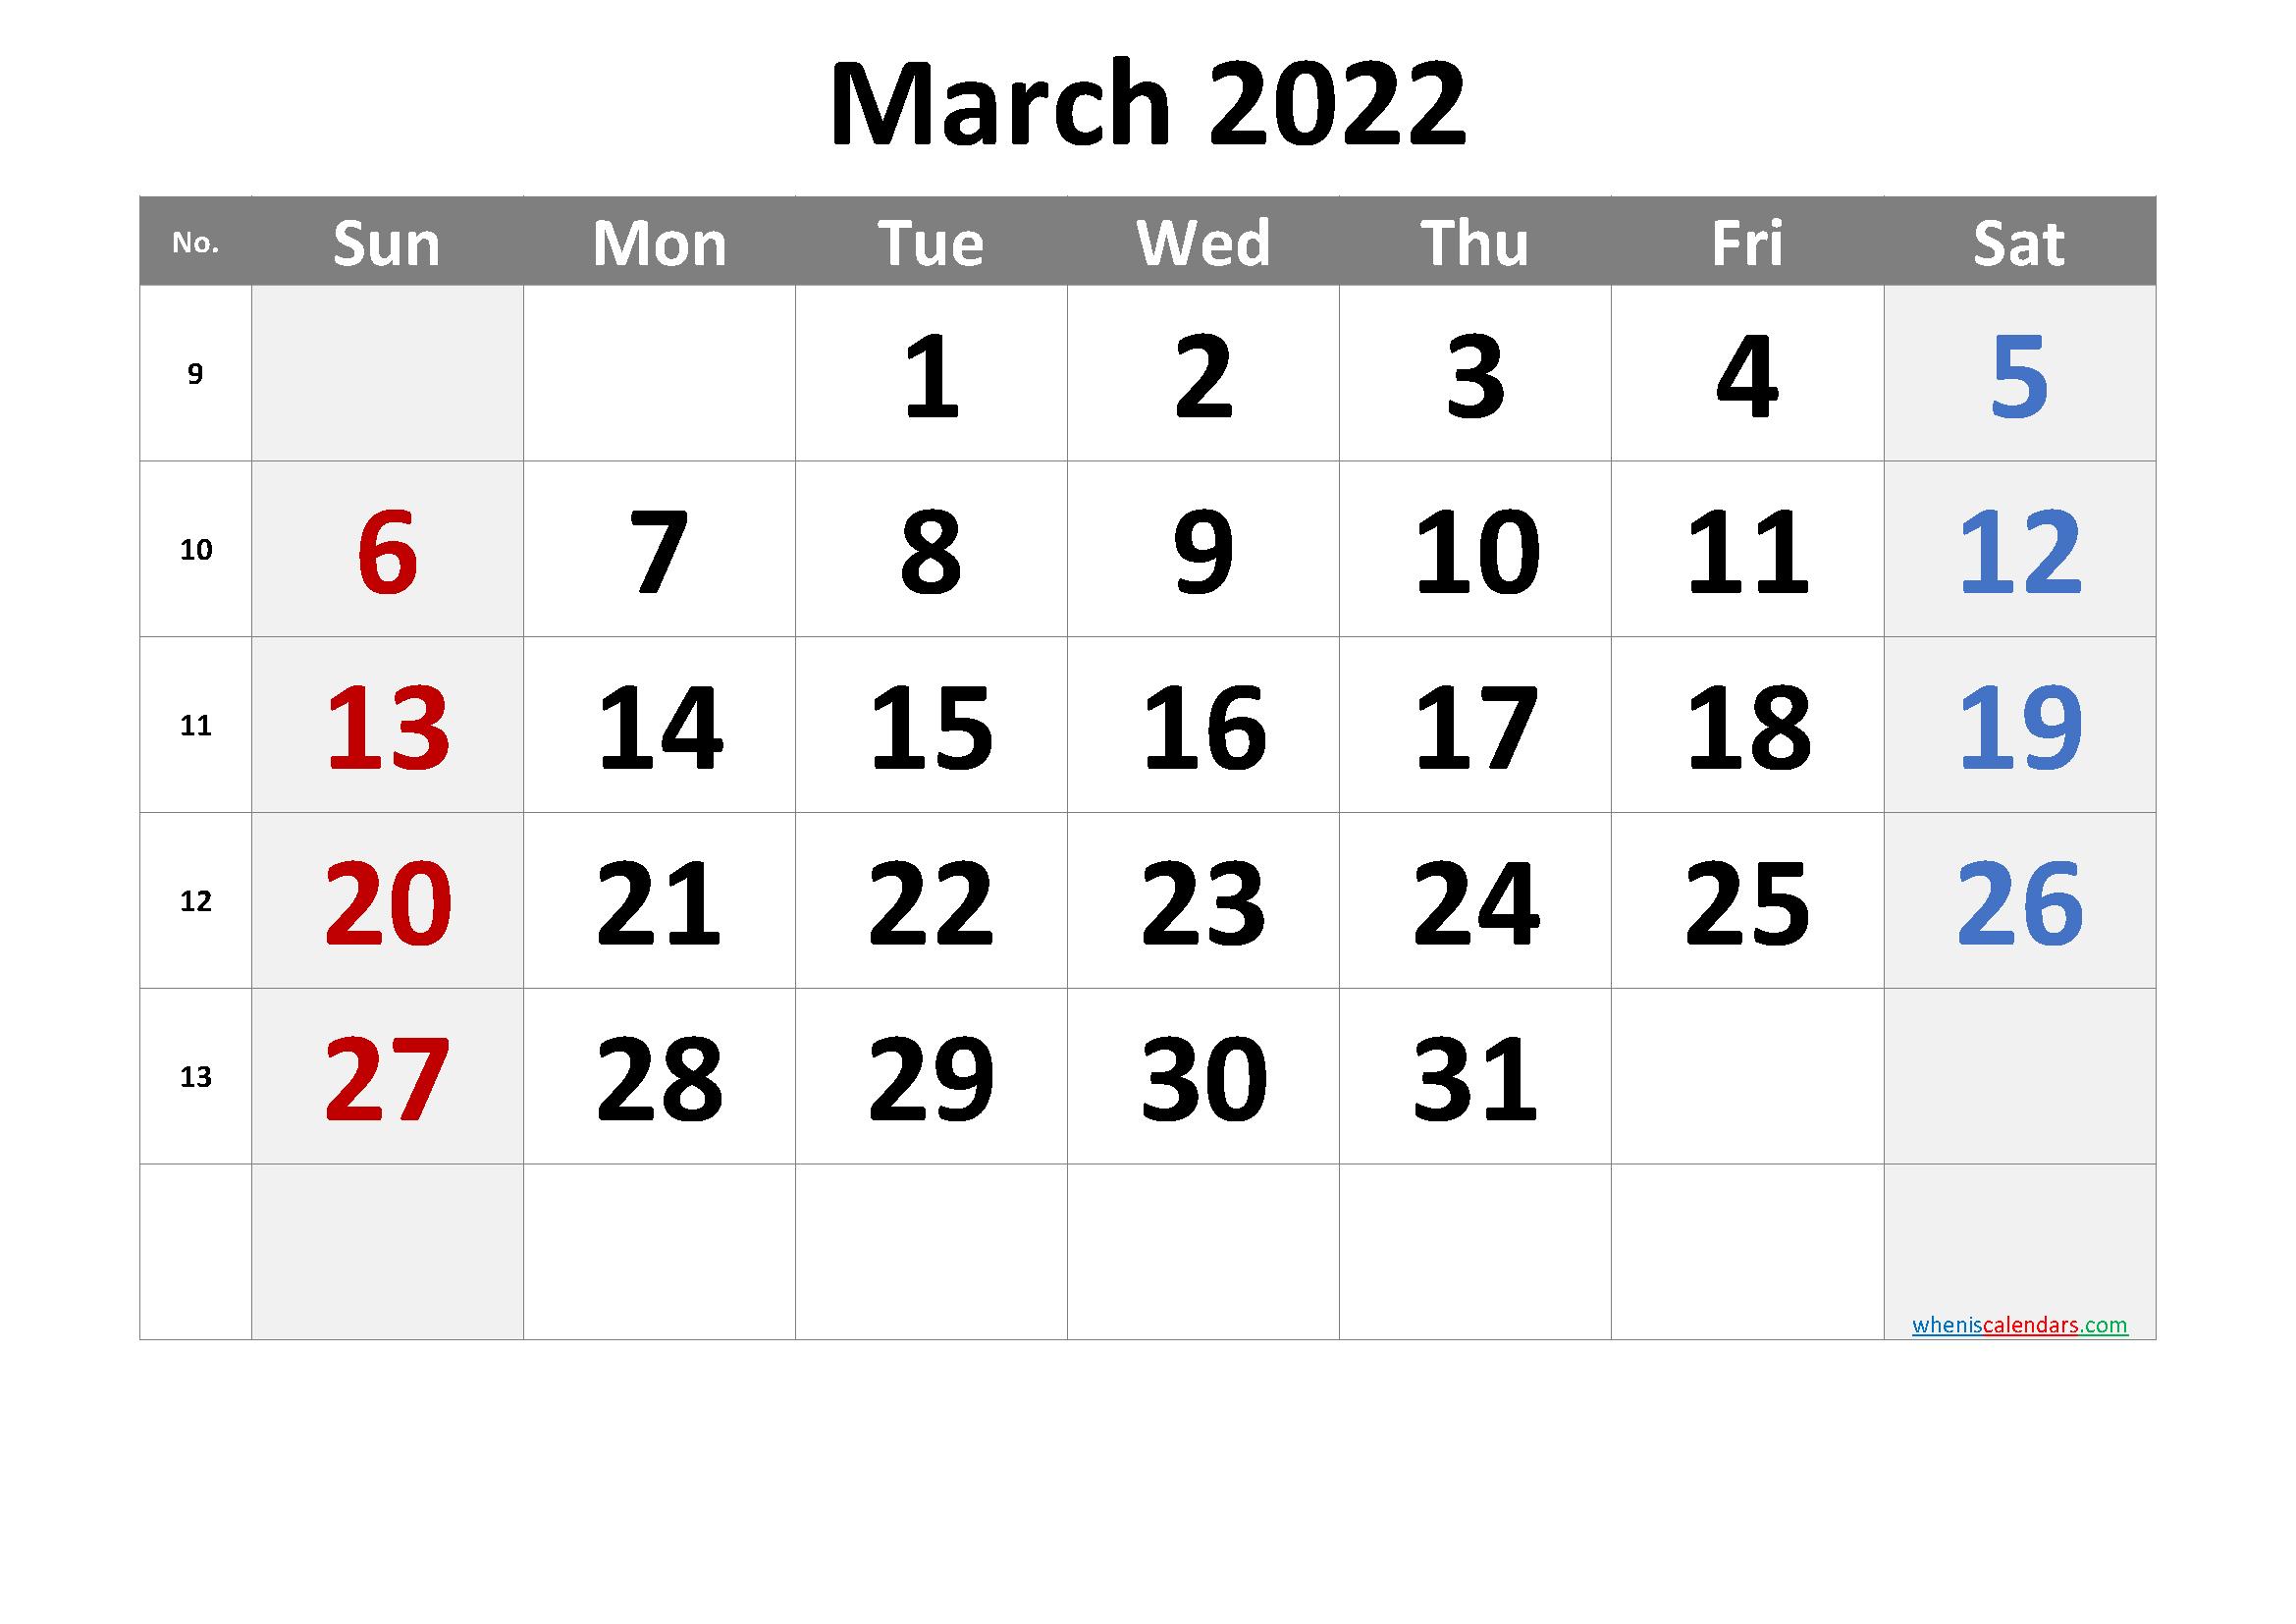 March 2022 Printable Calendar [Free Premium] for March 2022 Calendar Template Image